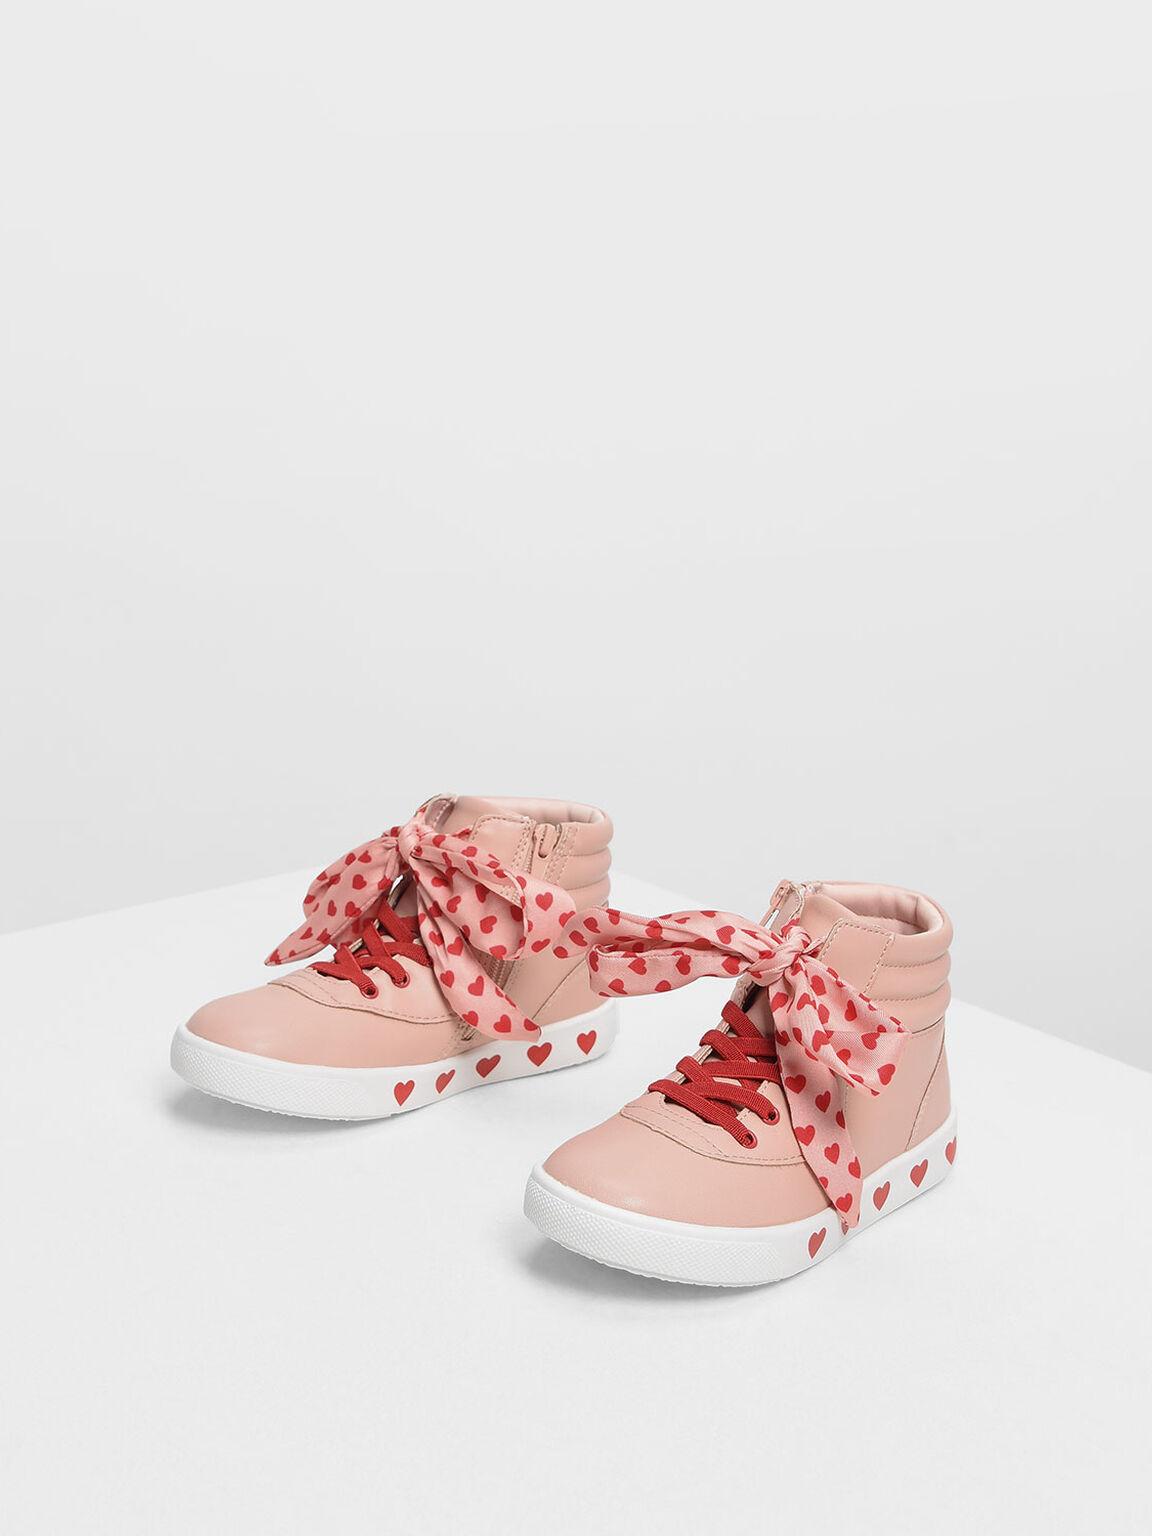 Kids' Heart Print High-Top Sneakers, Pink, hi-res